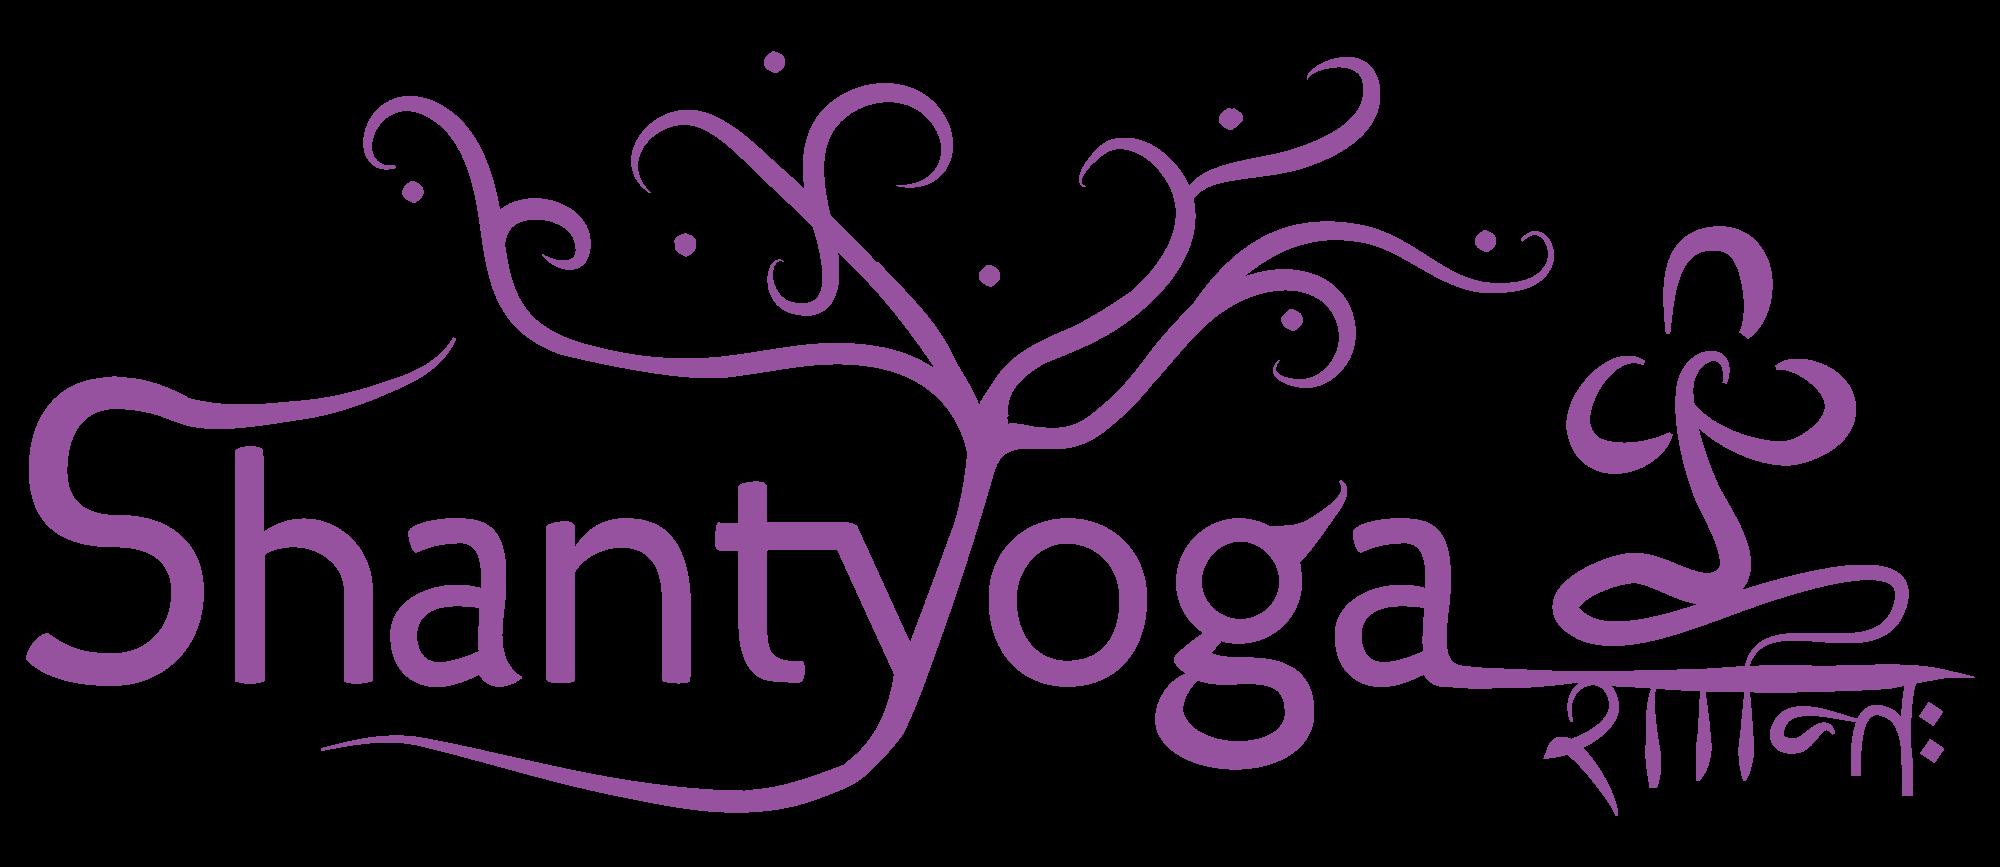 Shantyoga formation yoga